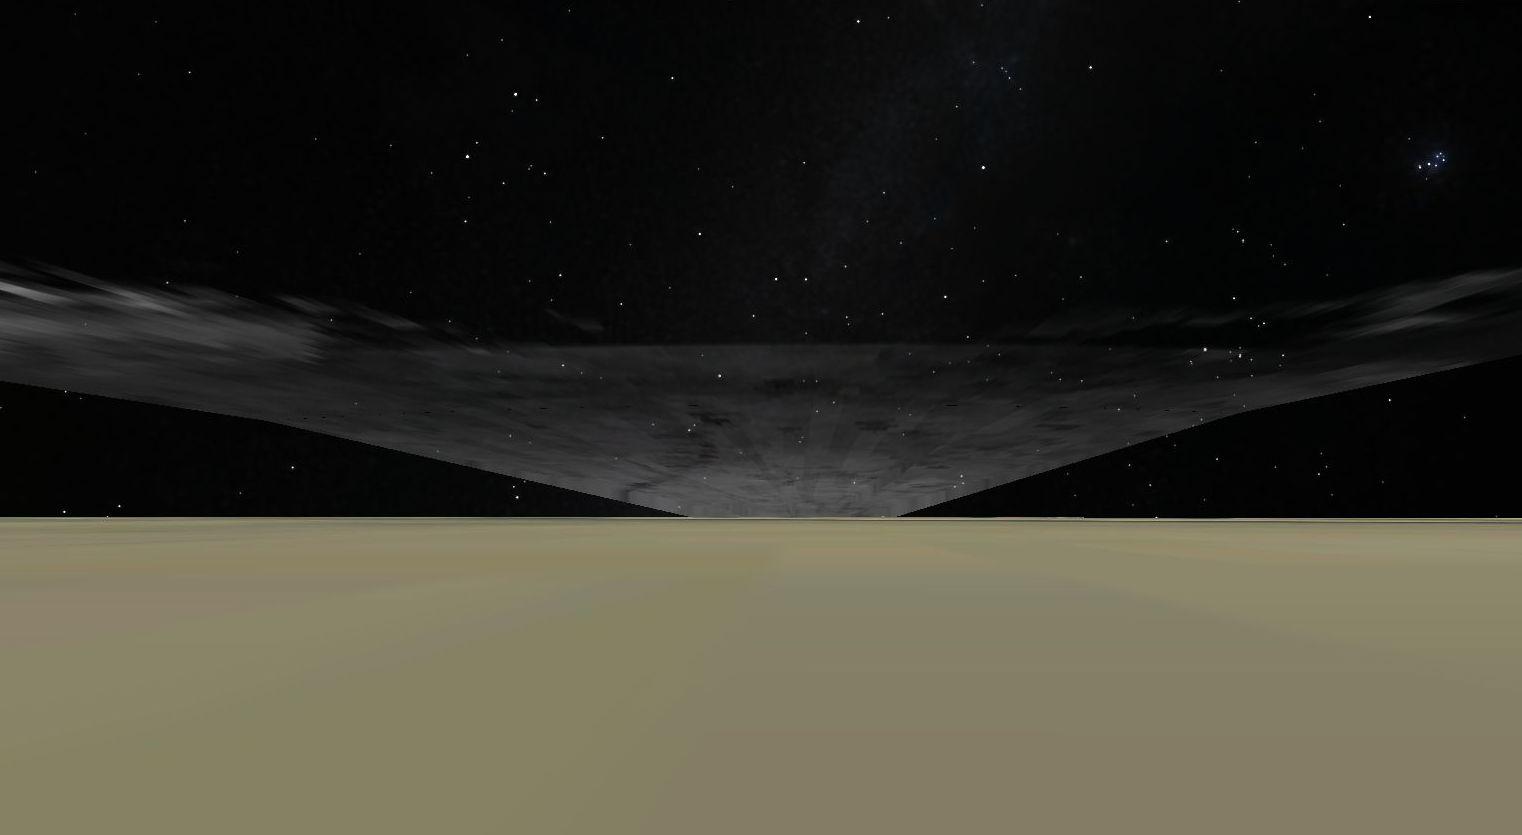 Earth20180405 23 37北極ストリートビュー